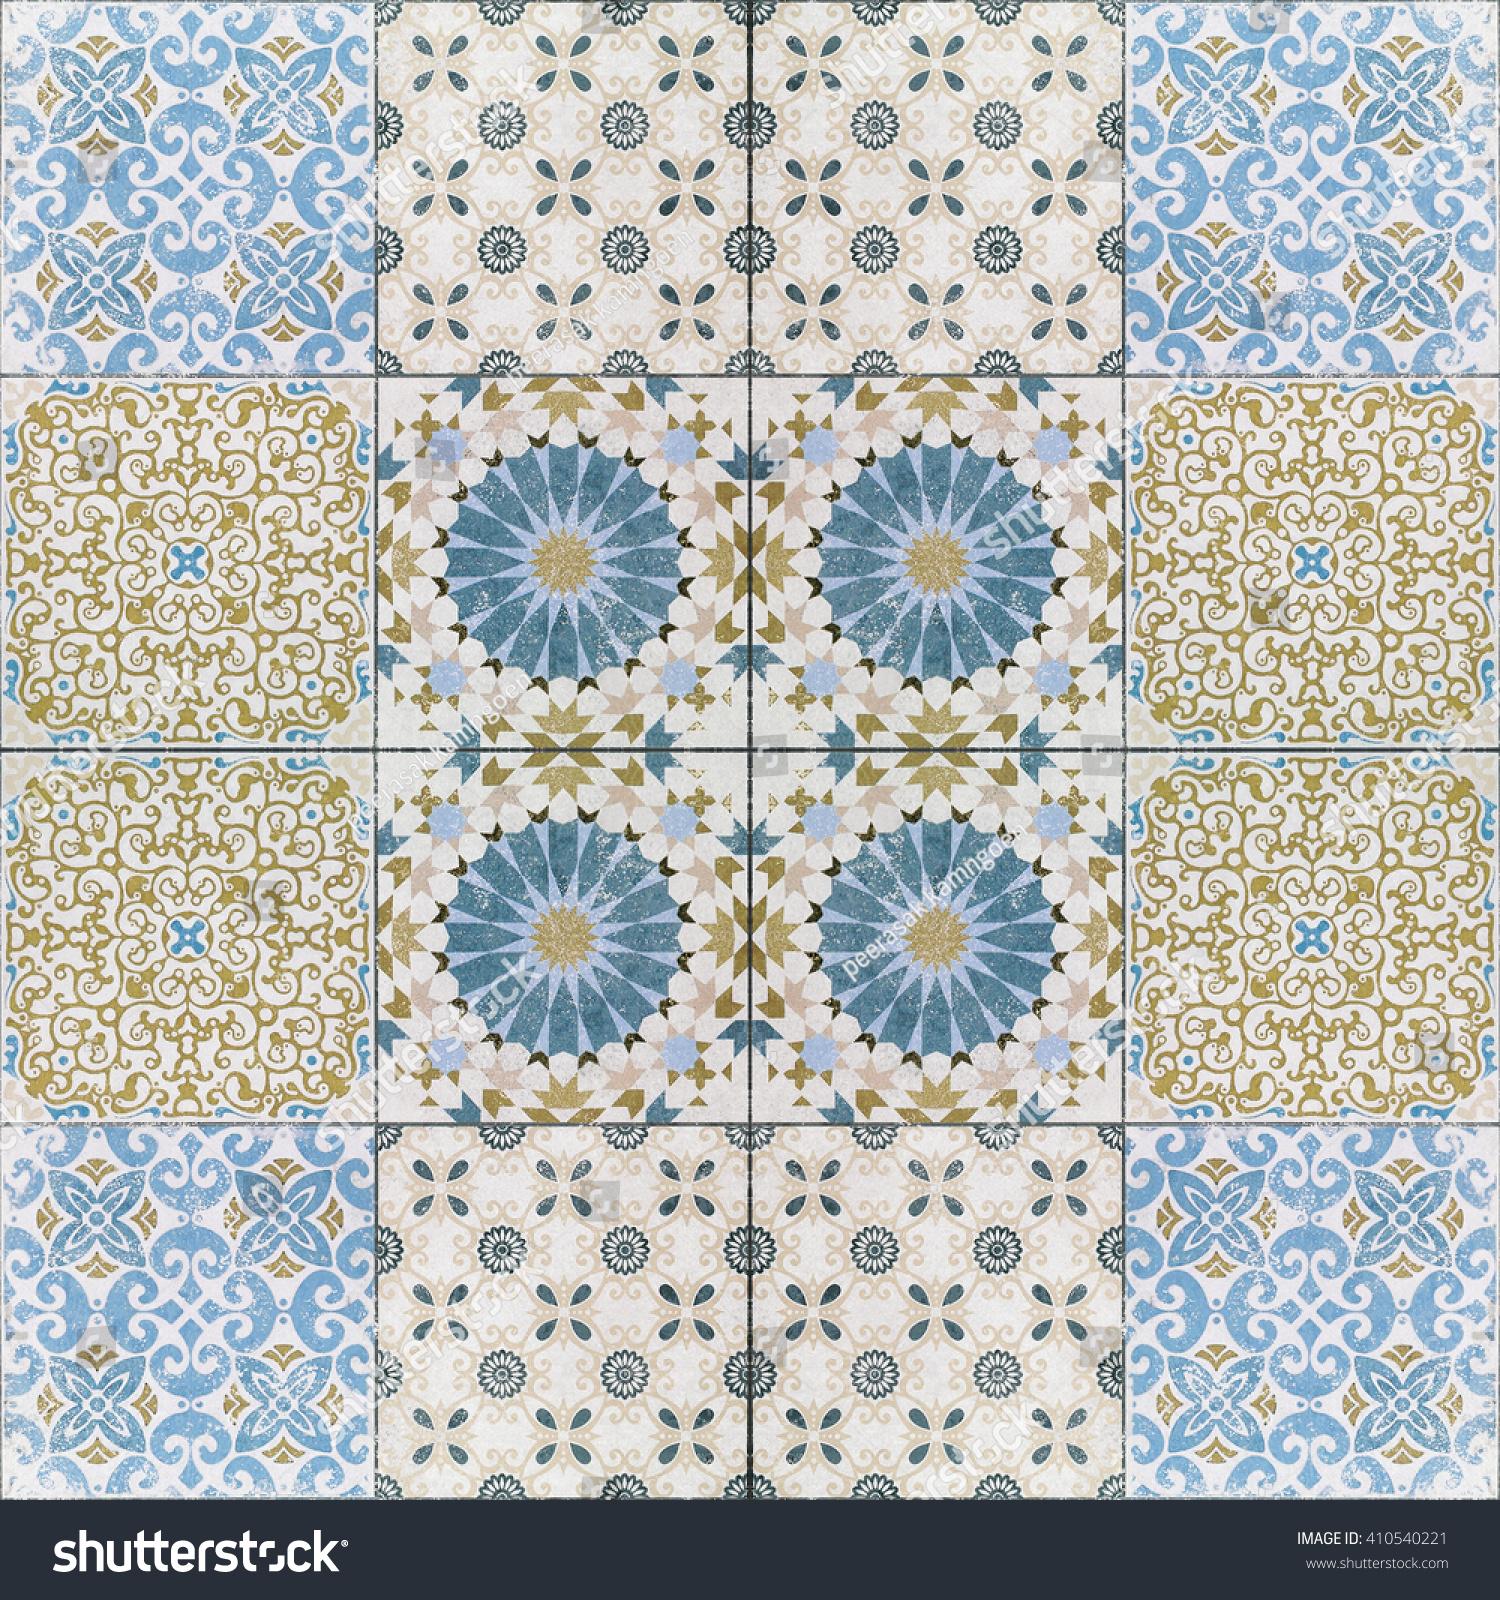 Beautiful old ceramic tiles patterns in the park public. | EZ Canvas